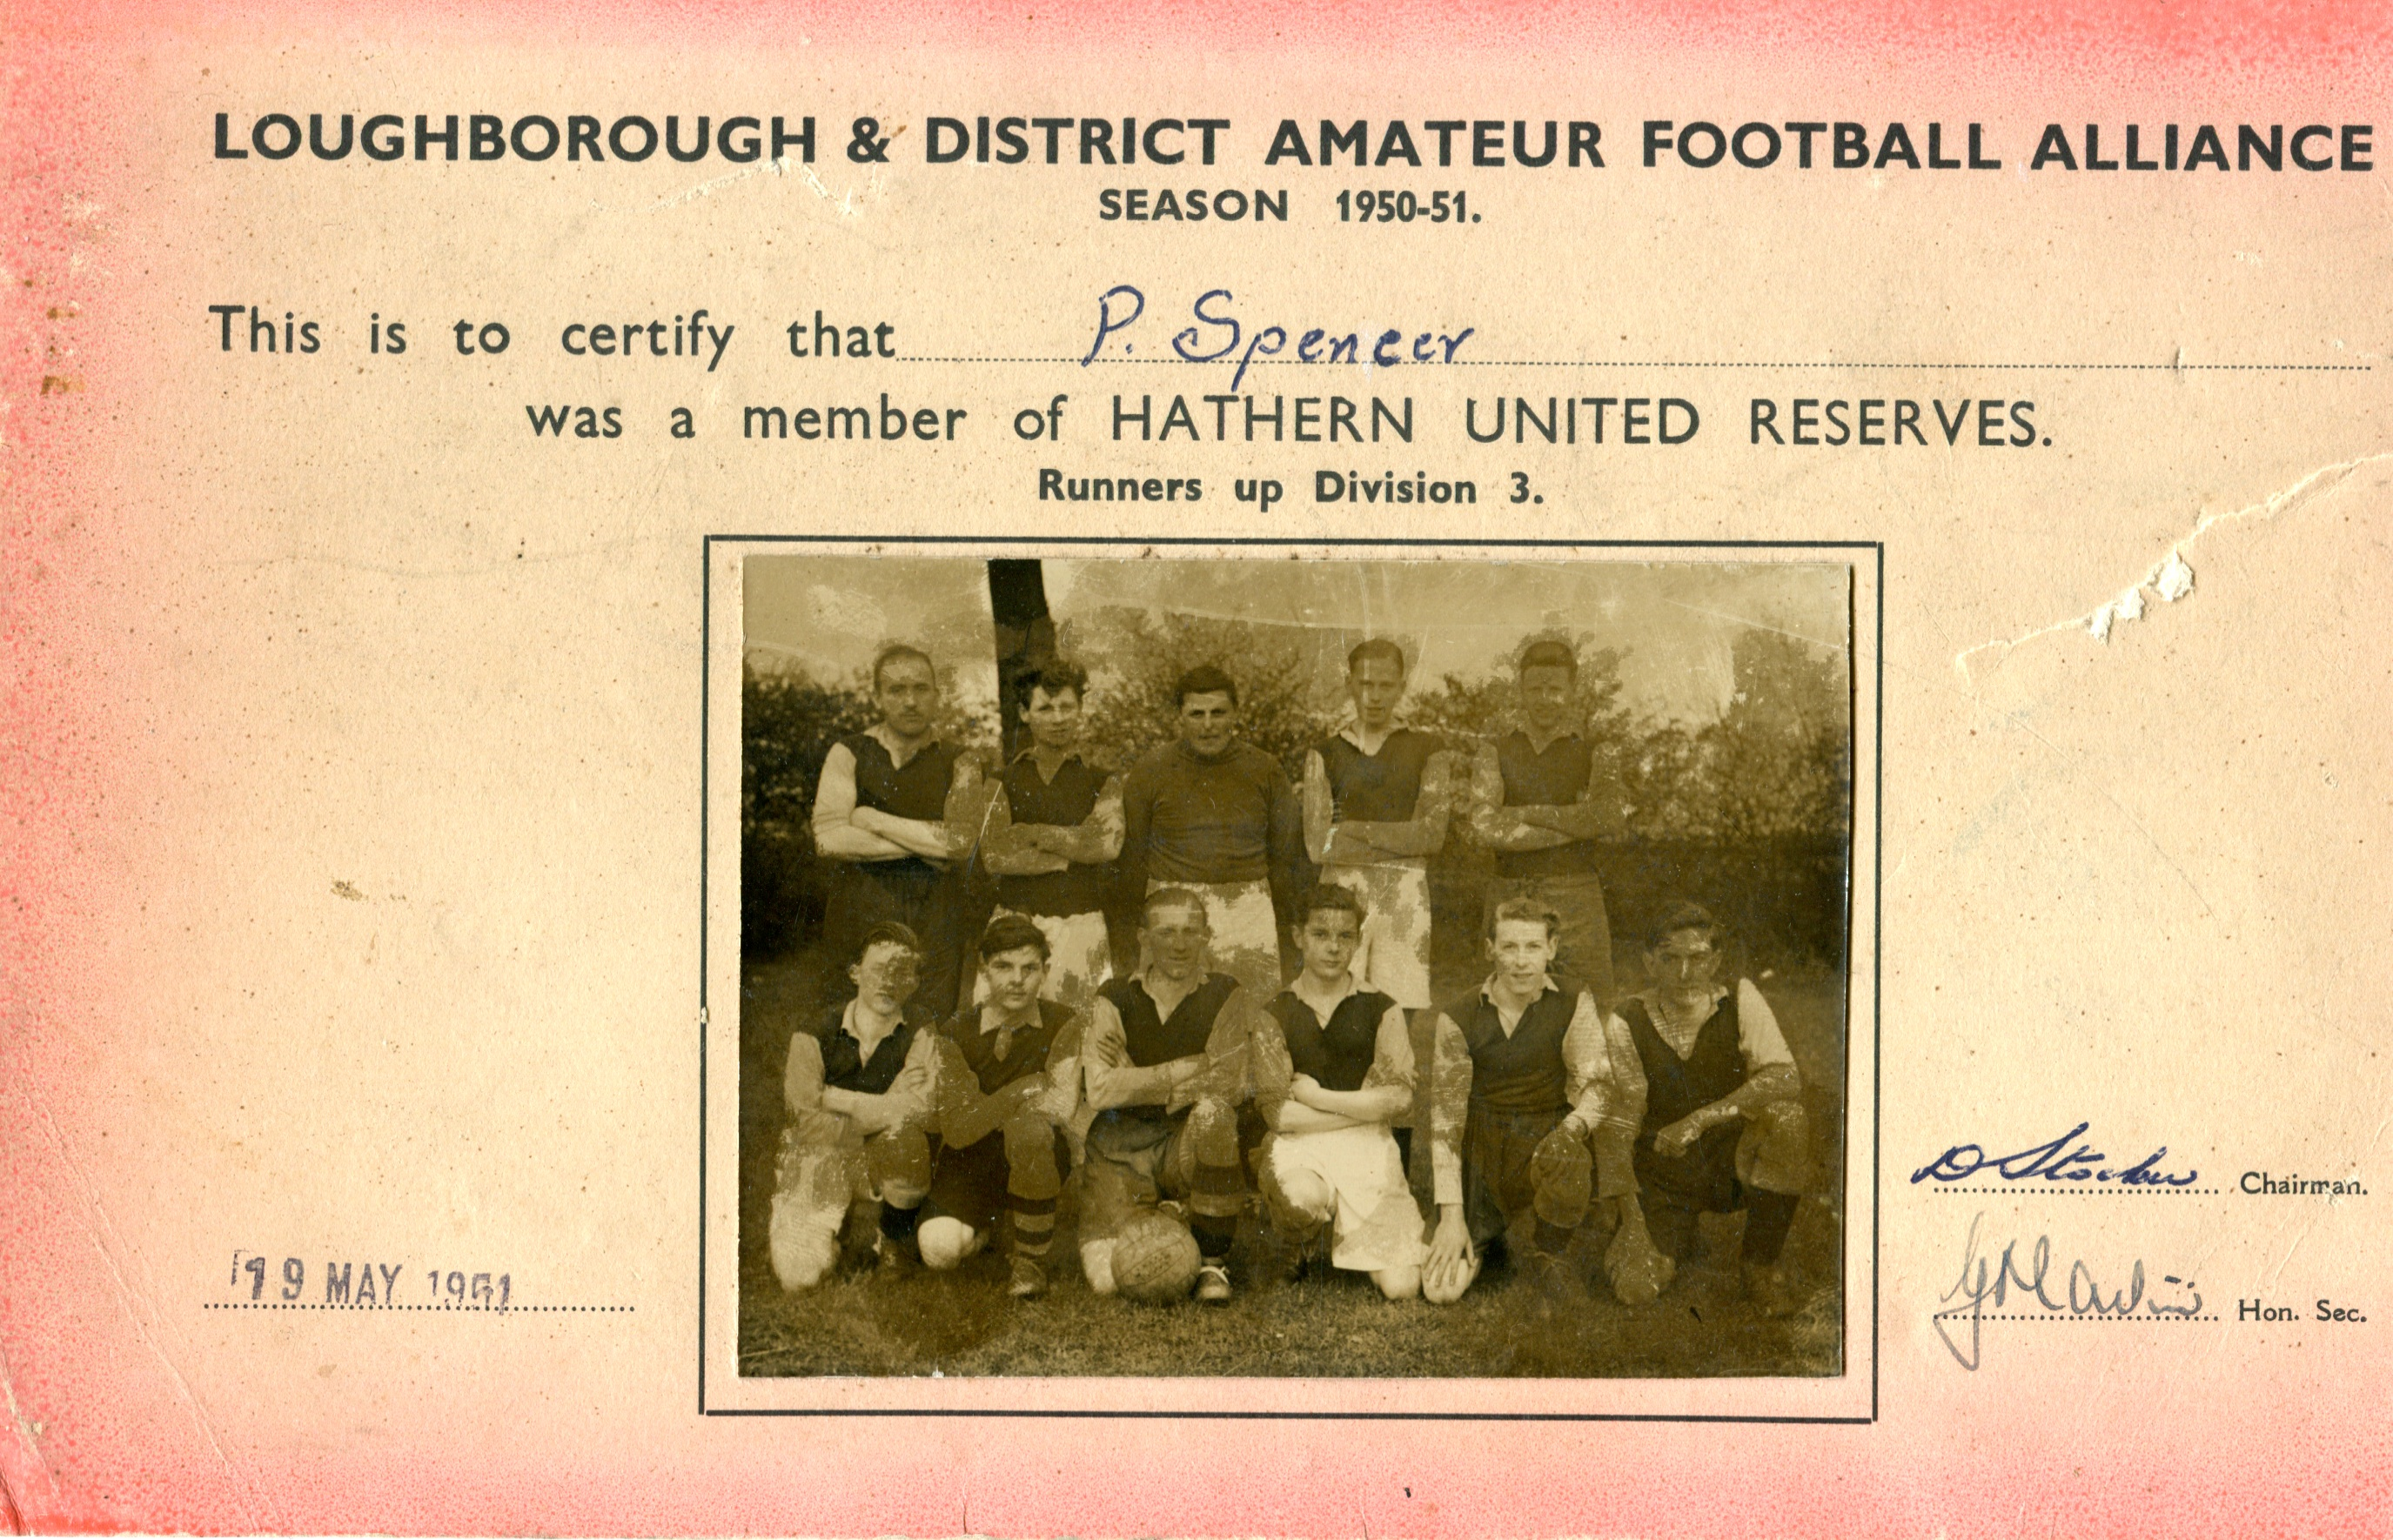 Football_certificate020.jpg